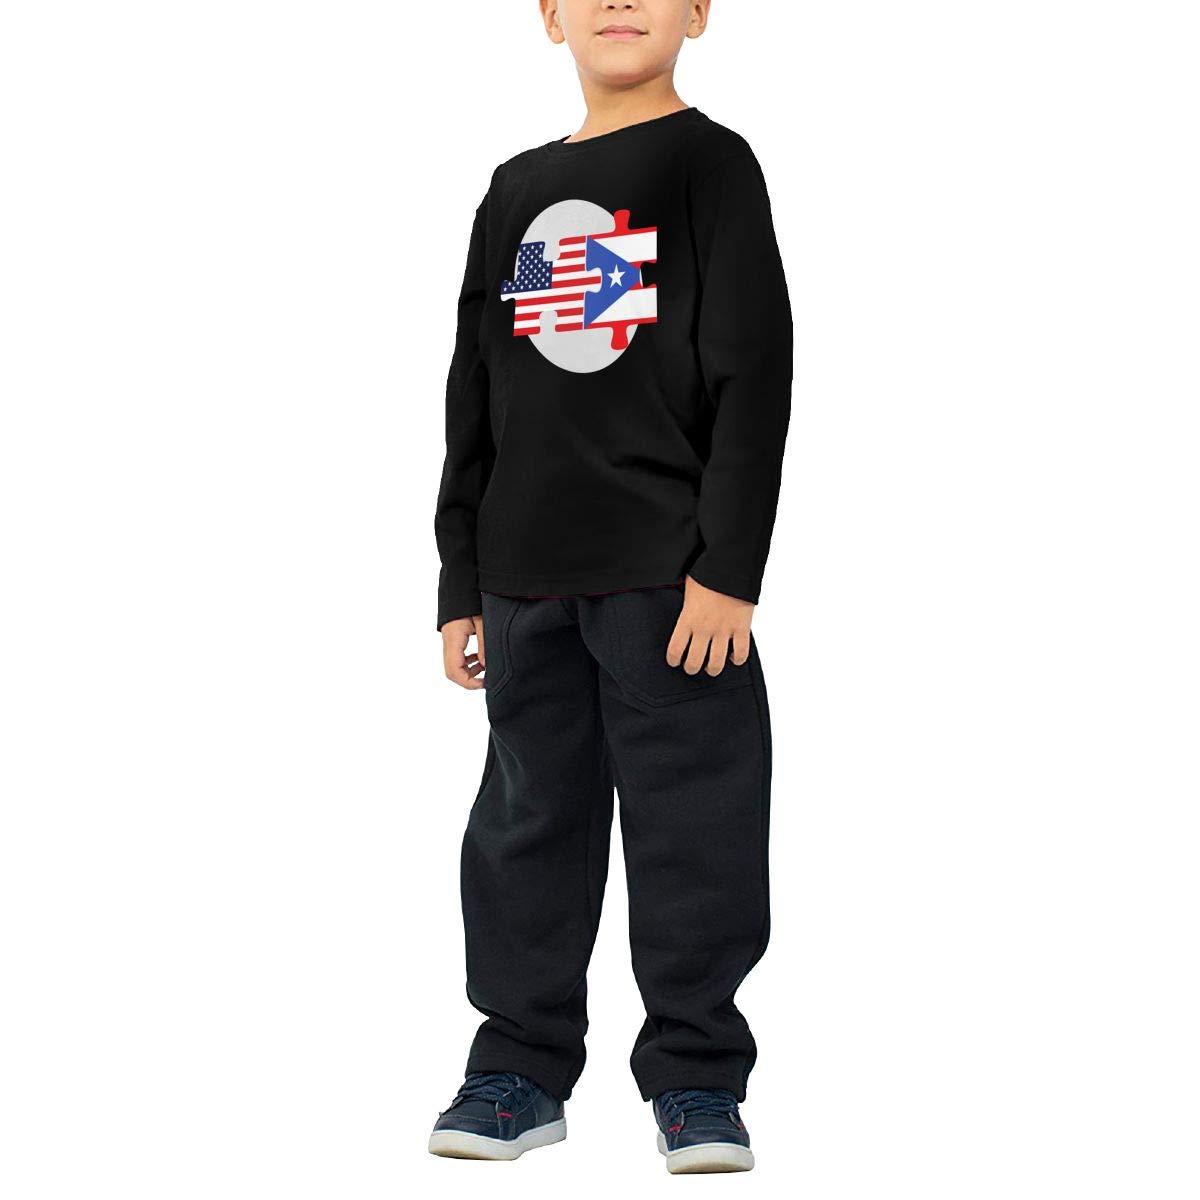 Little Boys U.S and Puerto Rico Flags ComfortSoft Long Sleeve T-Shirt